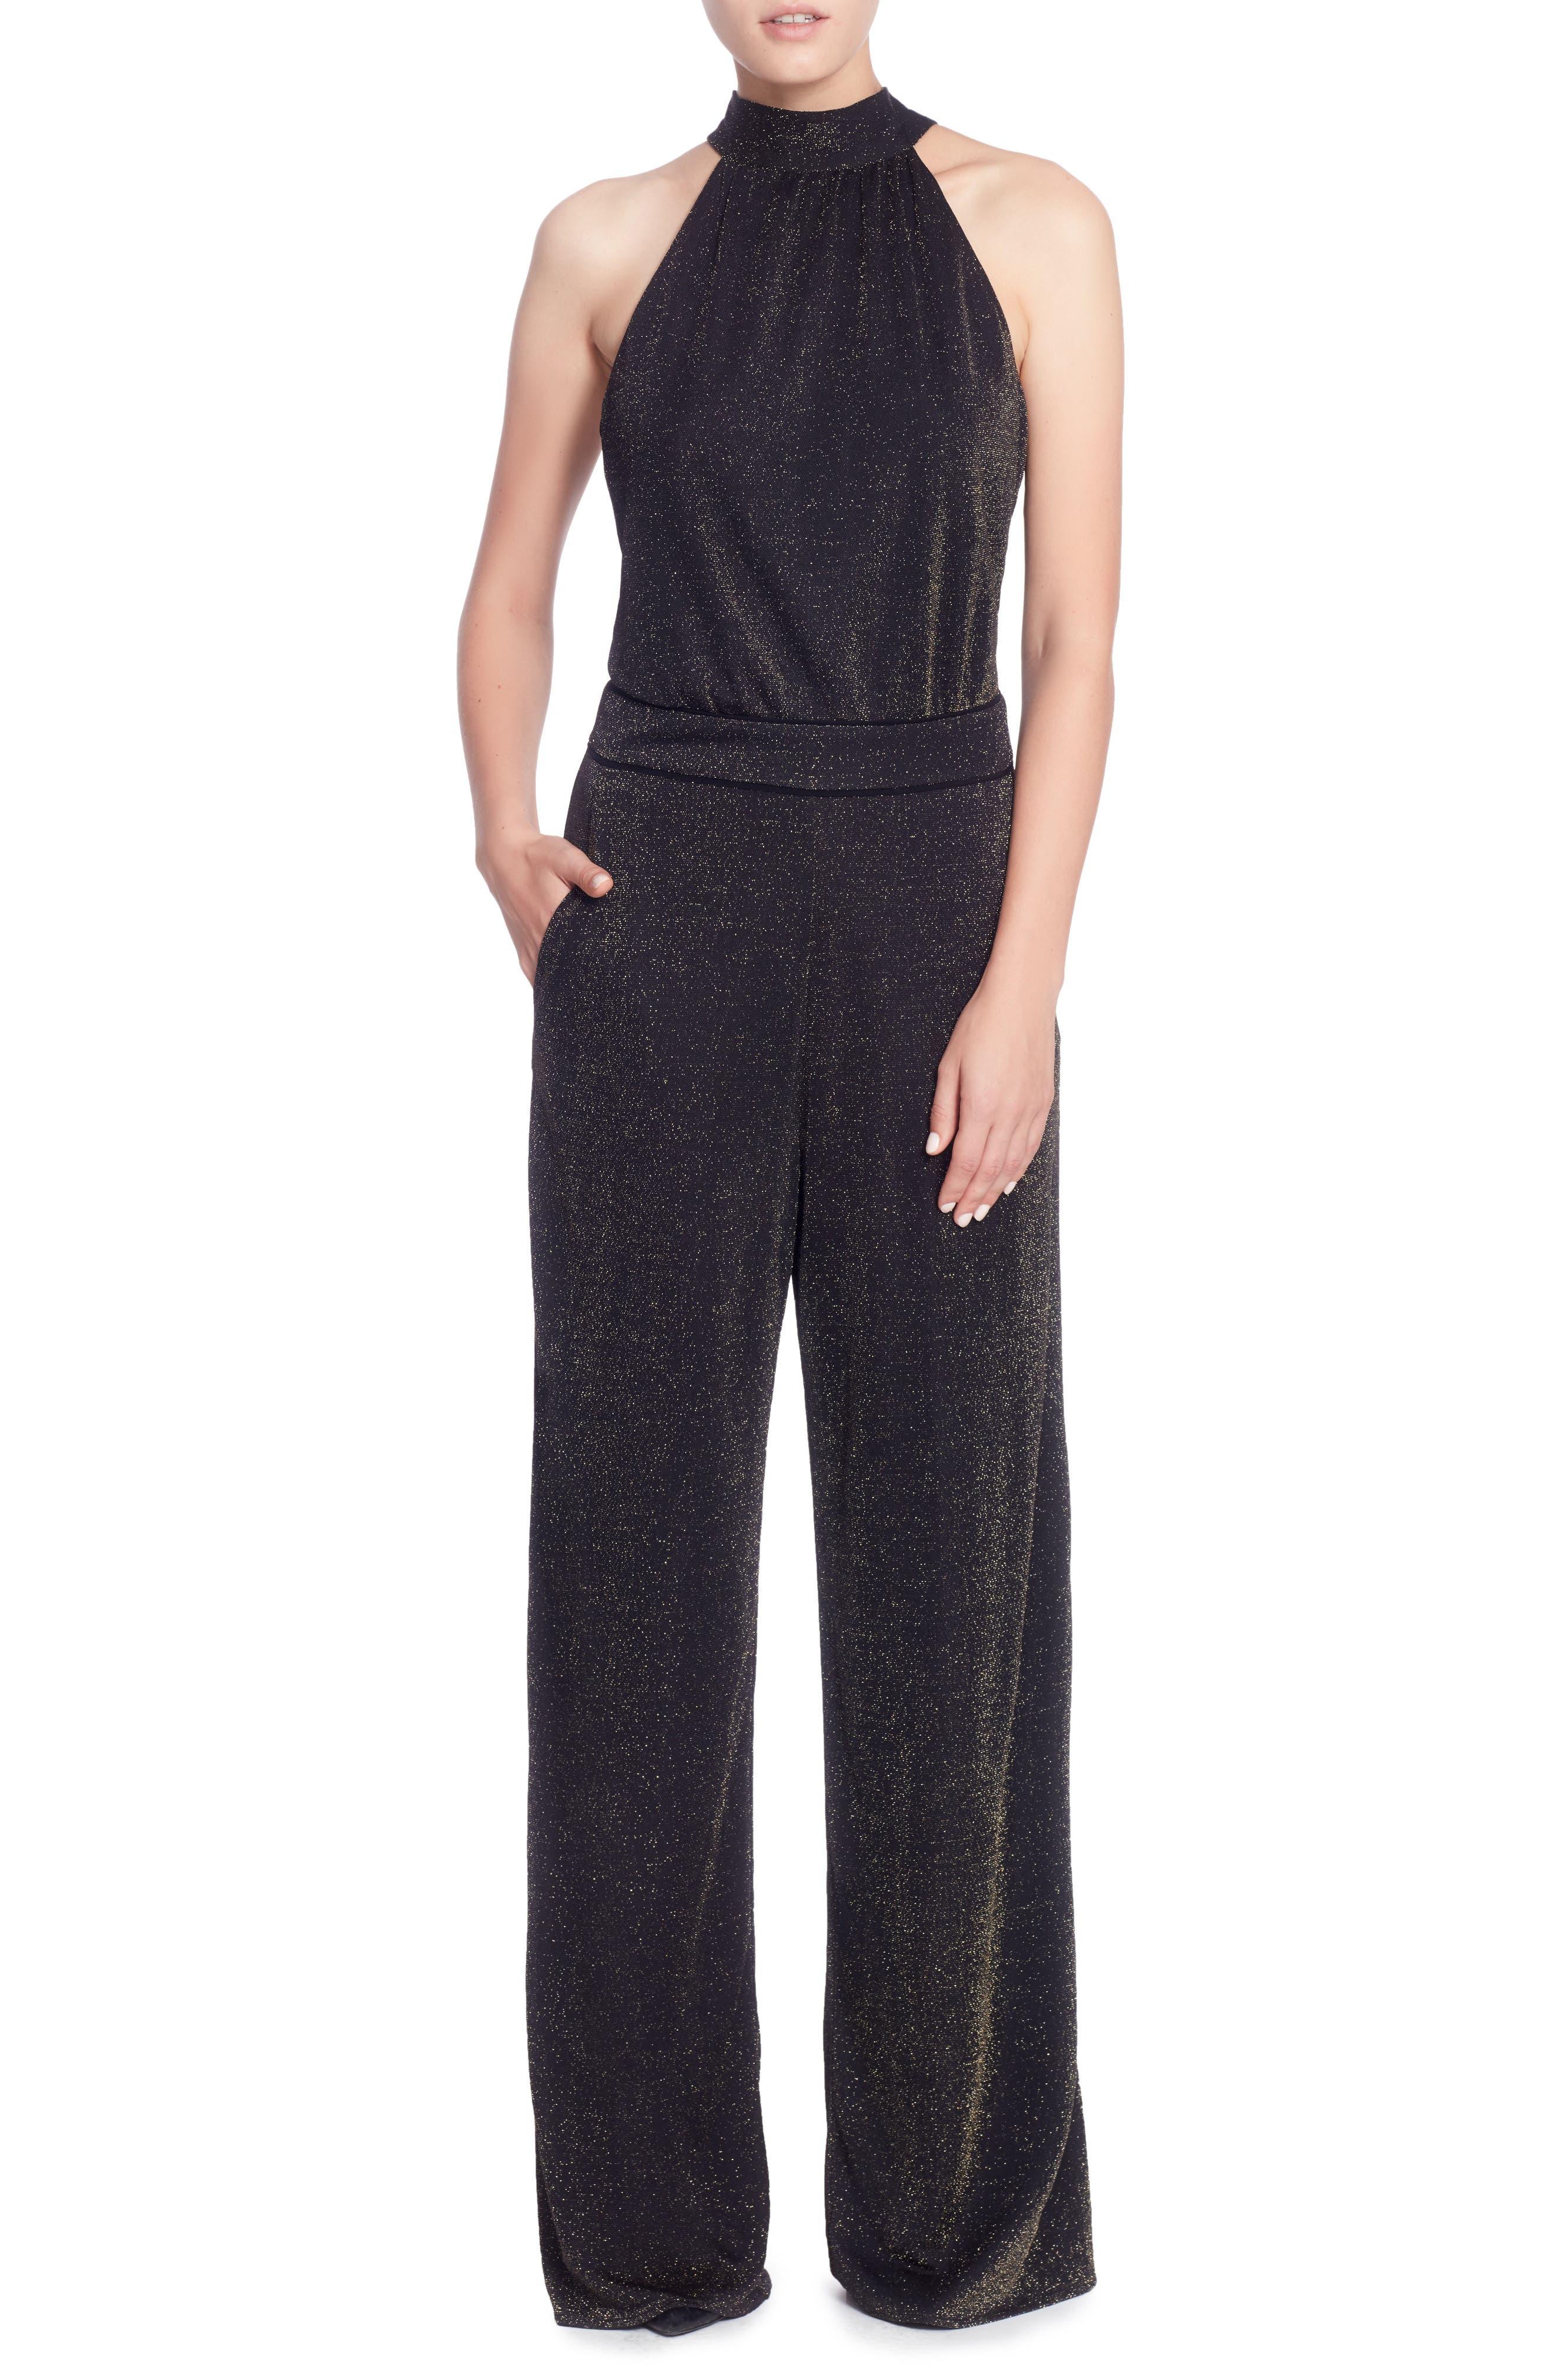 Campbell Jumpsuit,                         Main,                         color, Black/ Gold